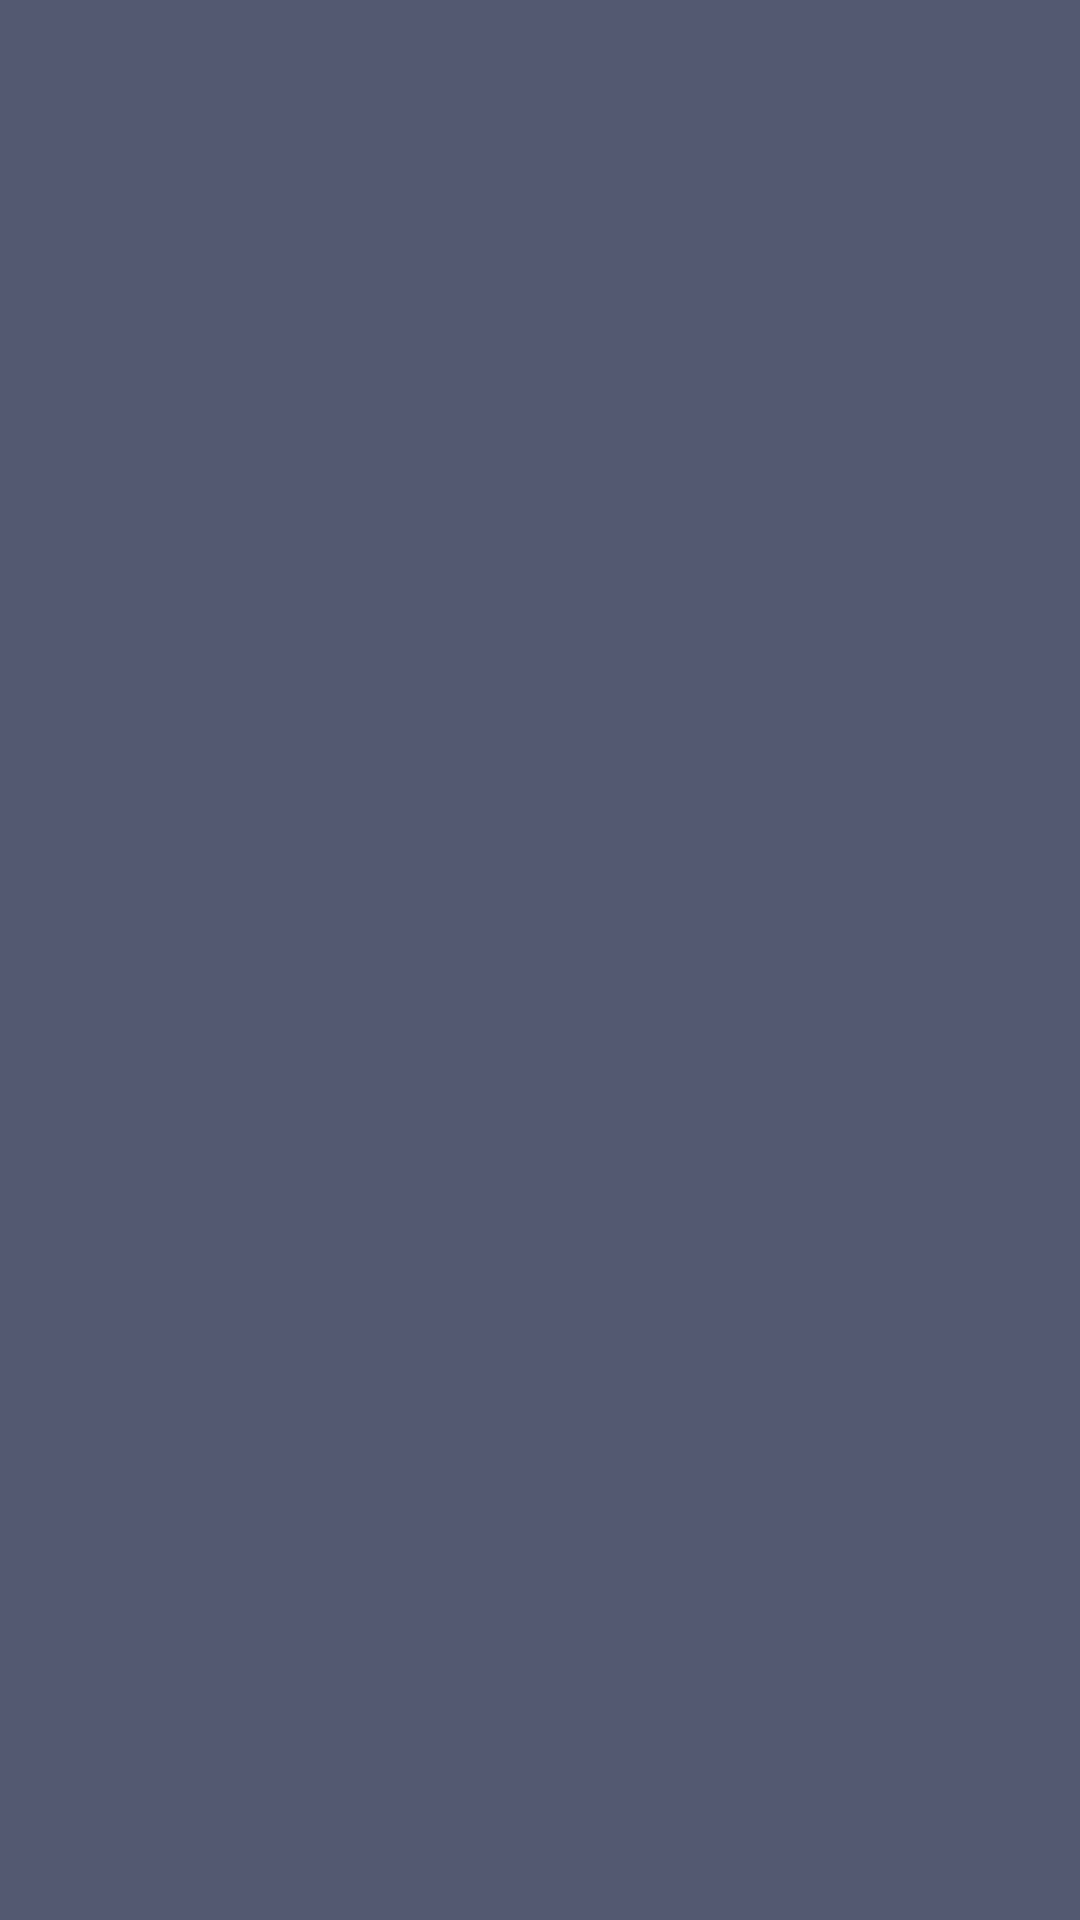 Simple Wallpaper Name Sony - f735123dfd56b6f0733ac7ec6c2a3054  Graphic_219419.jpg